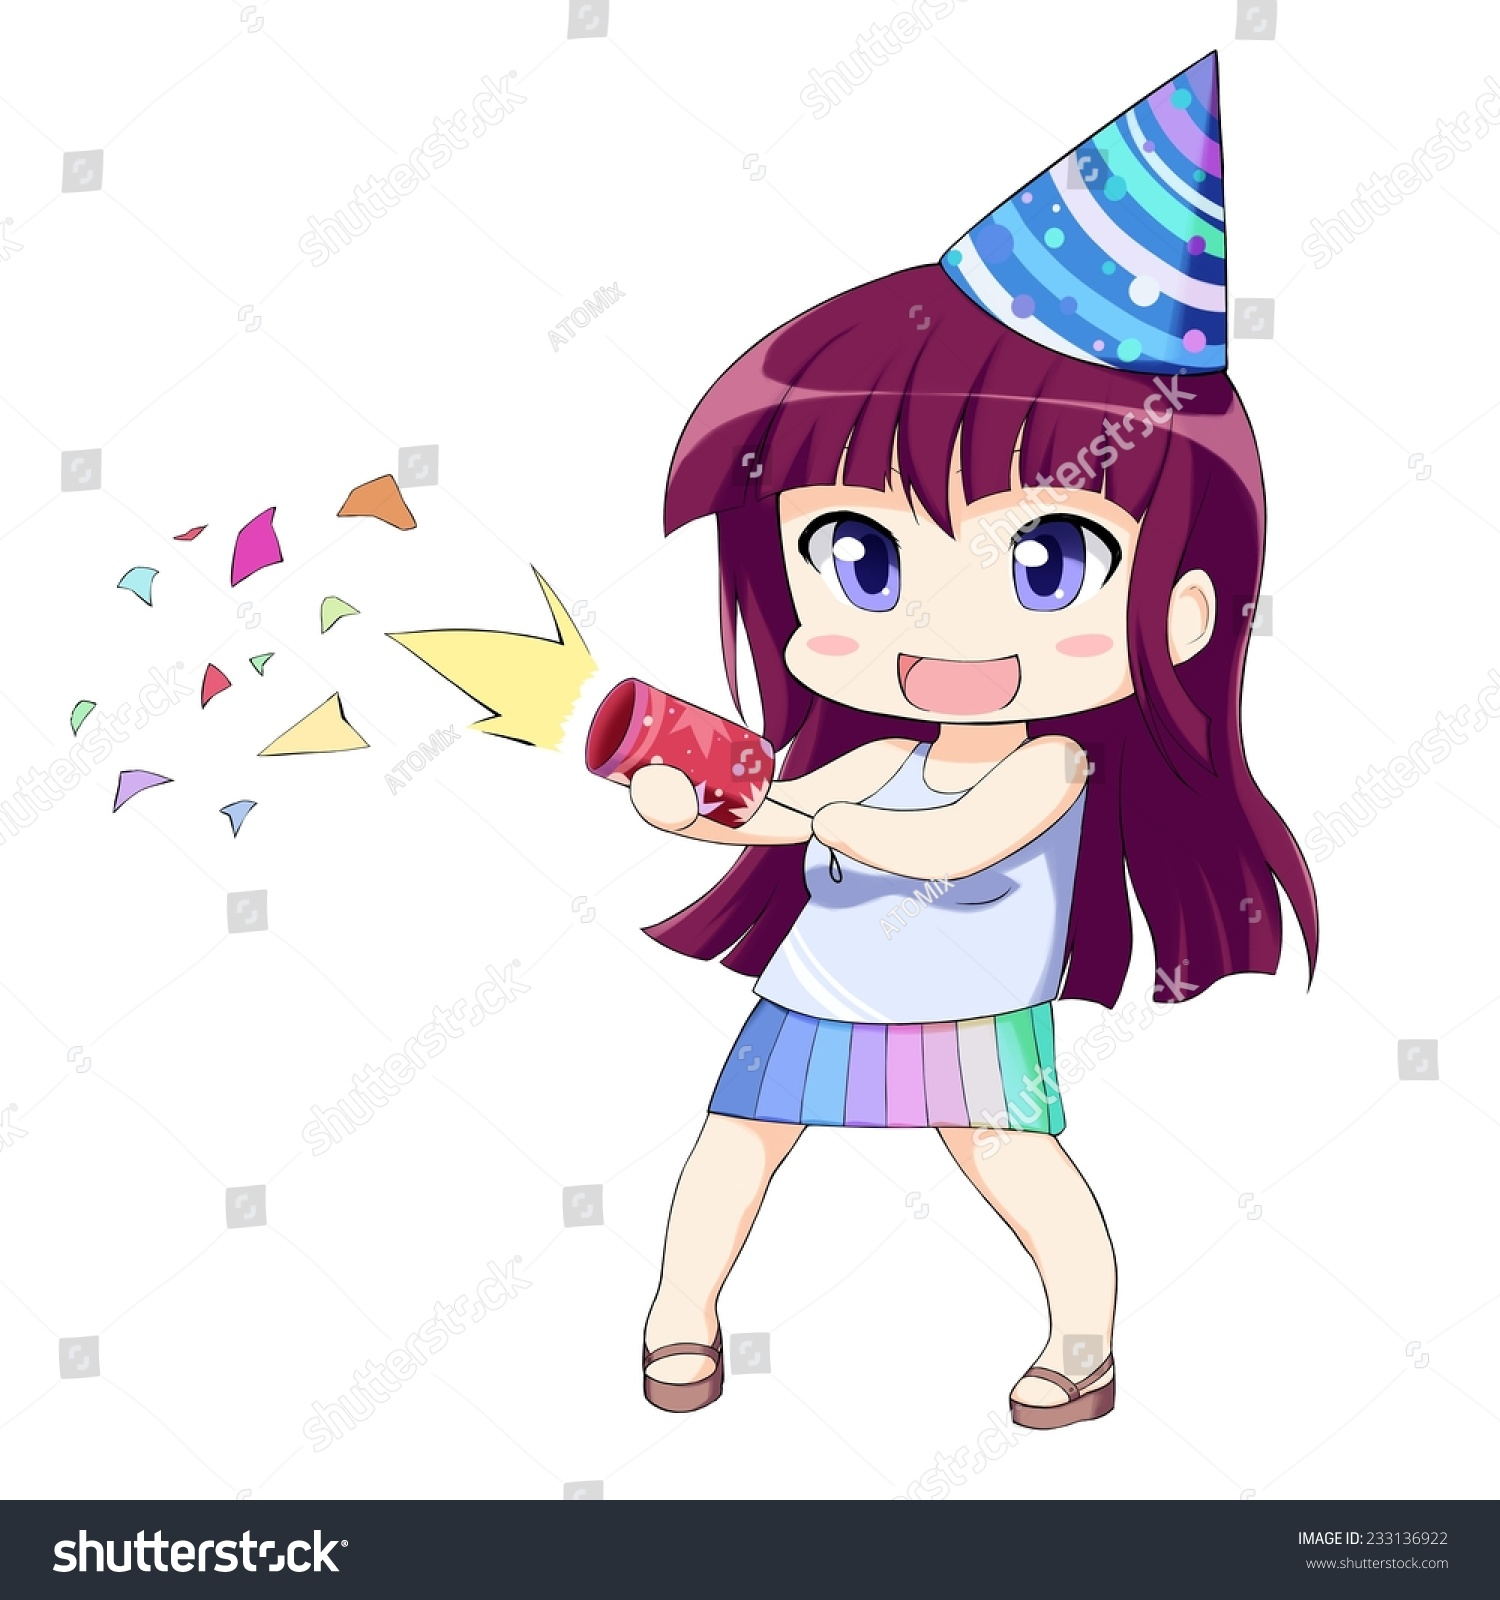 birthday anime Anime Happy Girl Petard Birthday Cap Stock Illustration 233136922  birthday anime